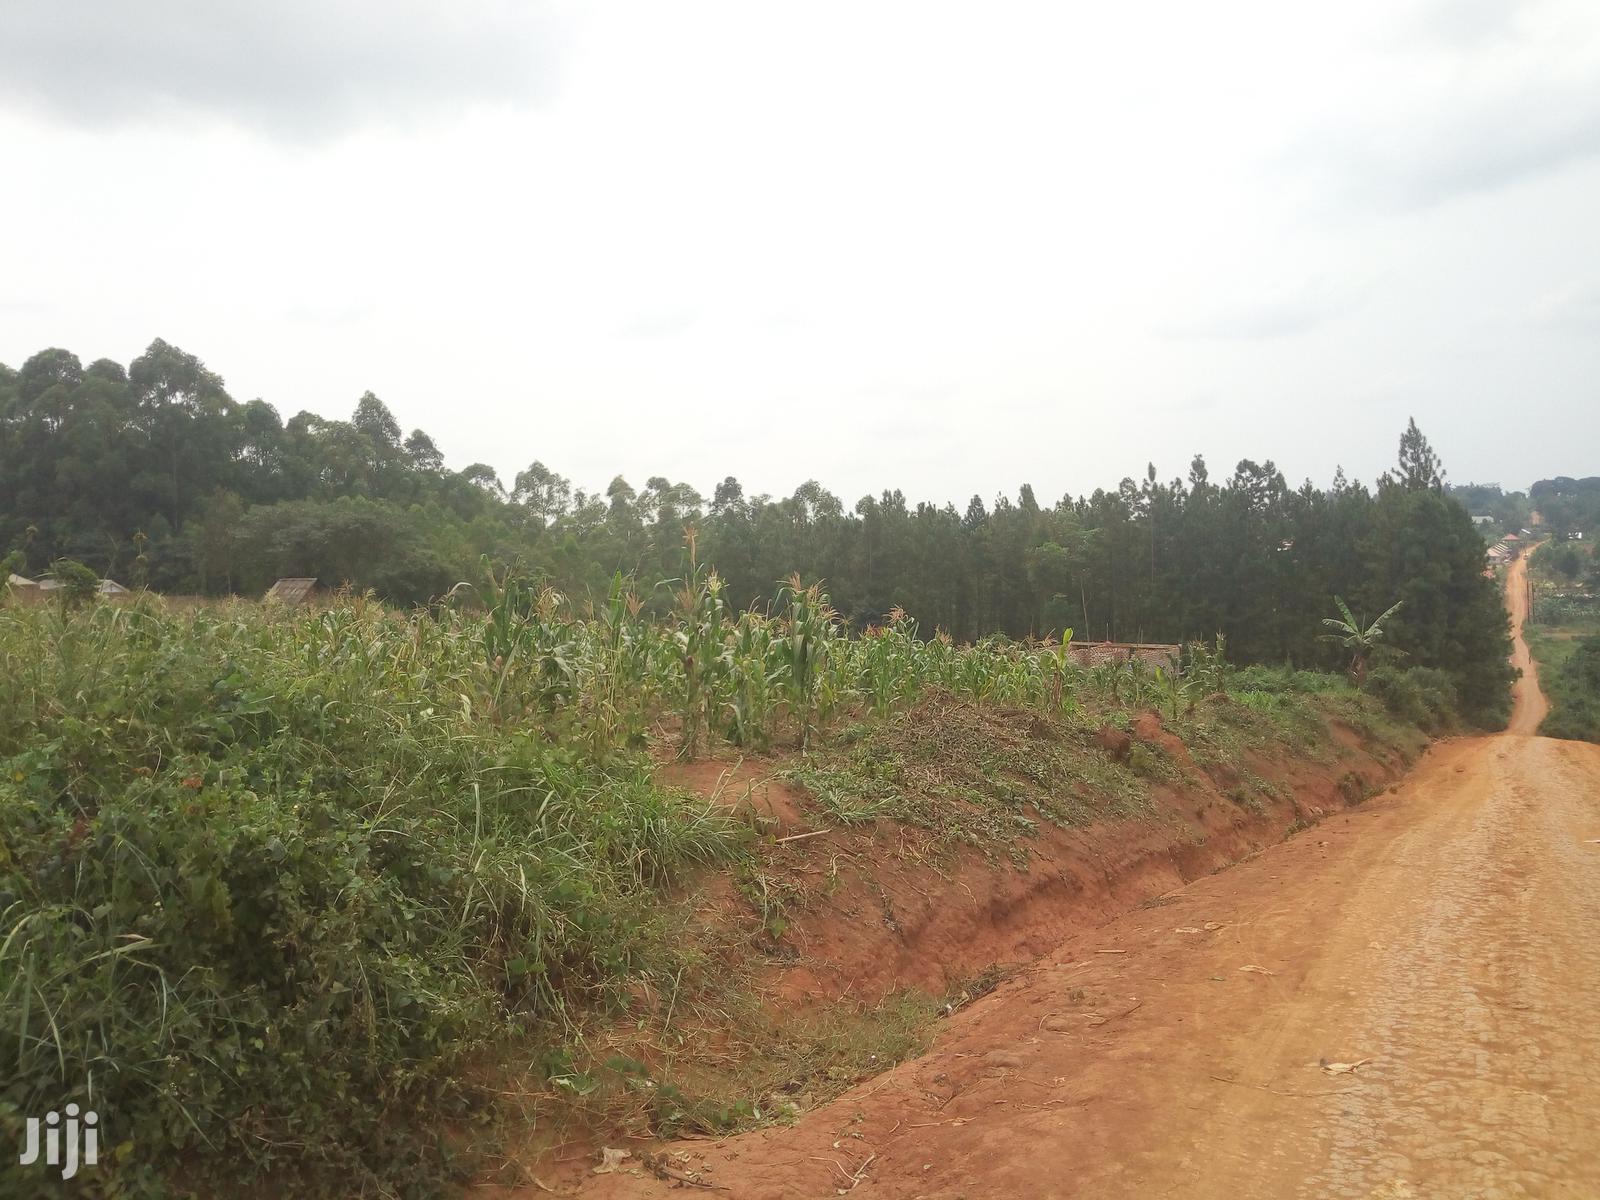 Plots at Kawanda Kiryagonja for Kats and Deo Surveys LTD